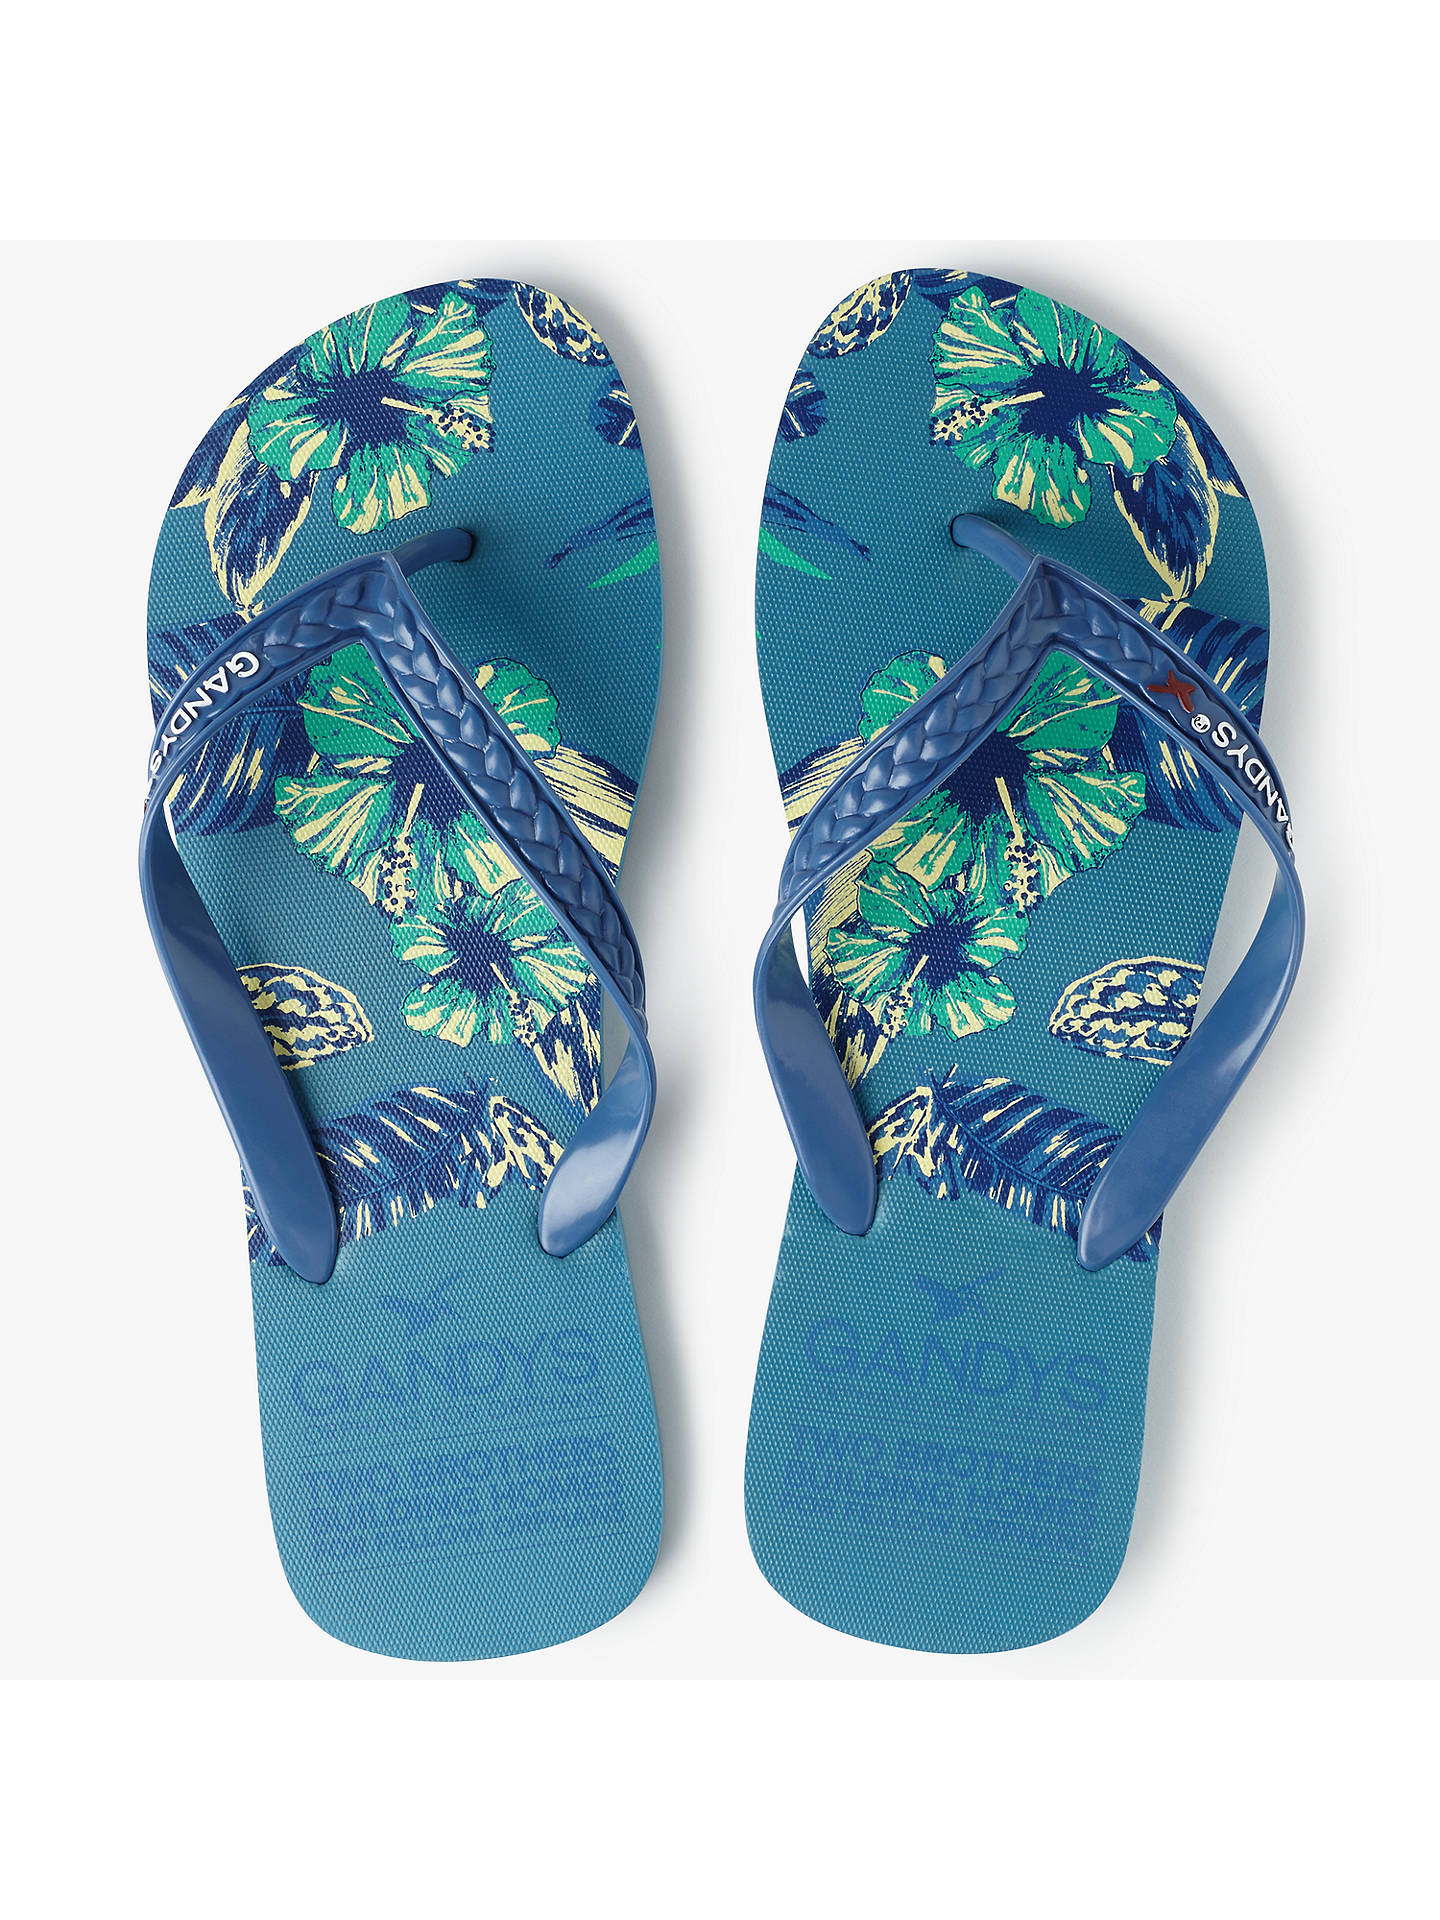 8d691bfce Buy Gandys for John Lewis Tropical Print Flip Flops